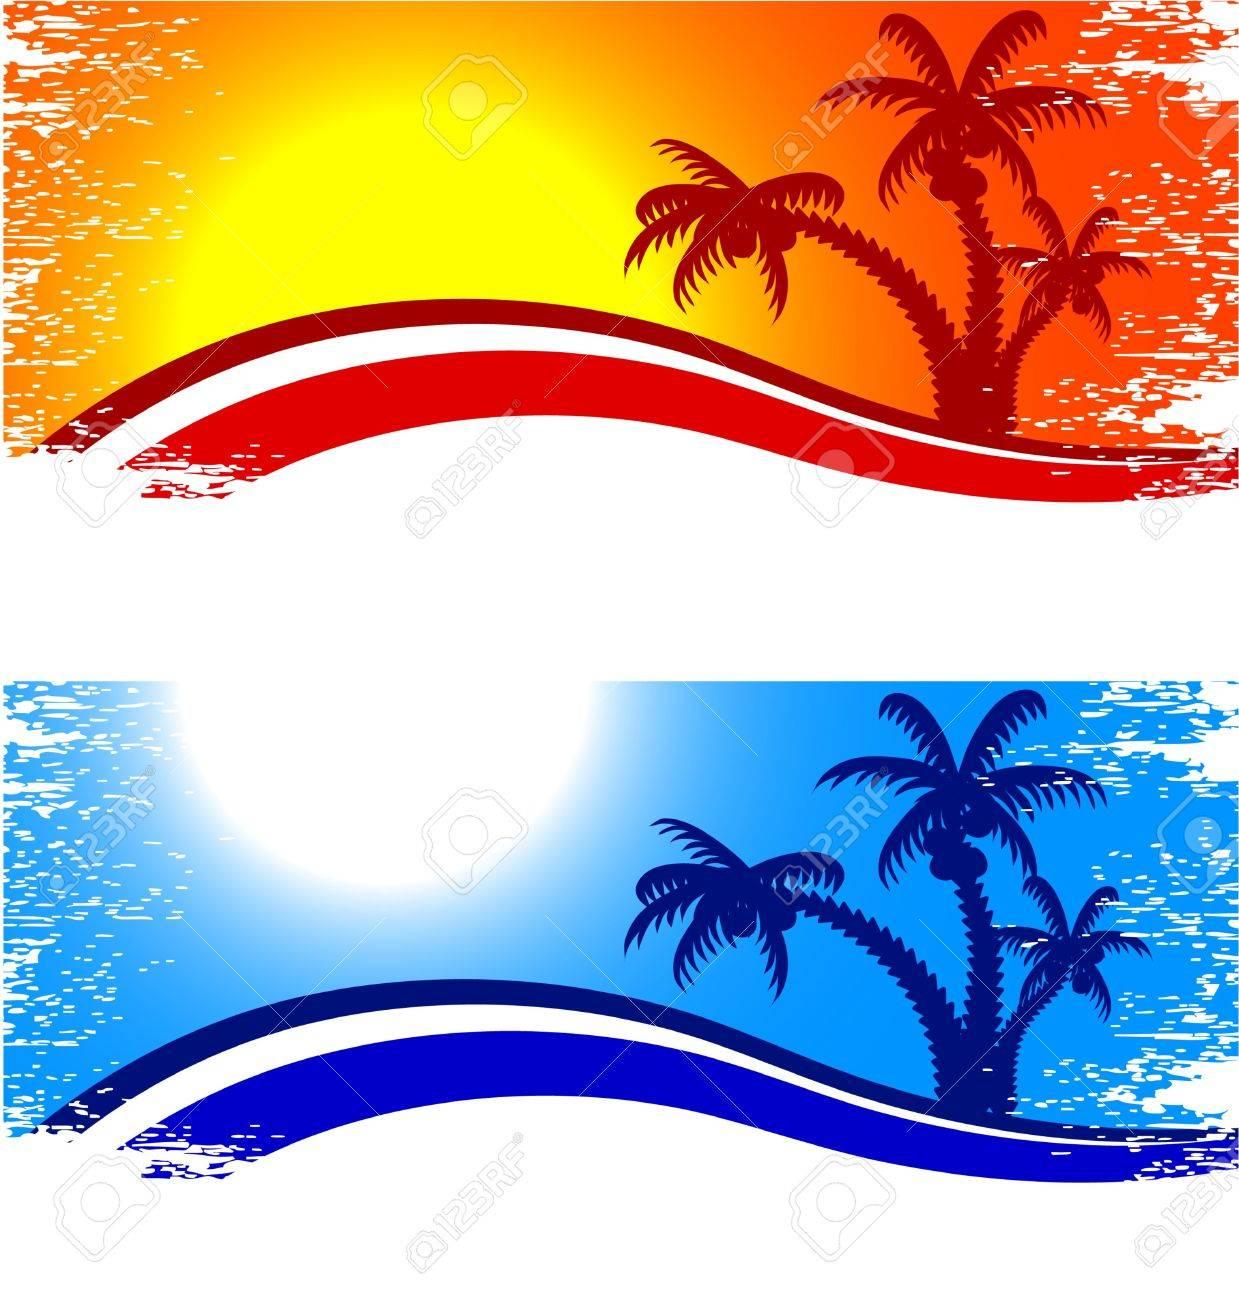 Tropical abstract backdrop. Vector illustration. Stock Vector - 4498425